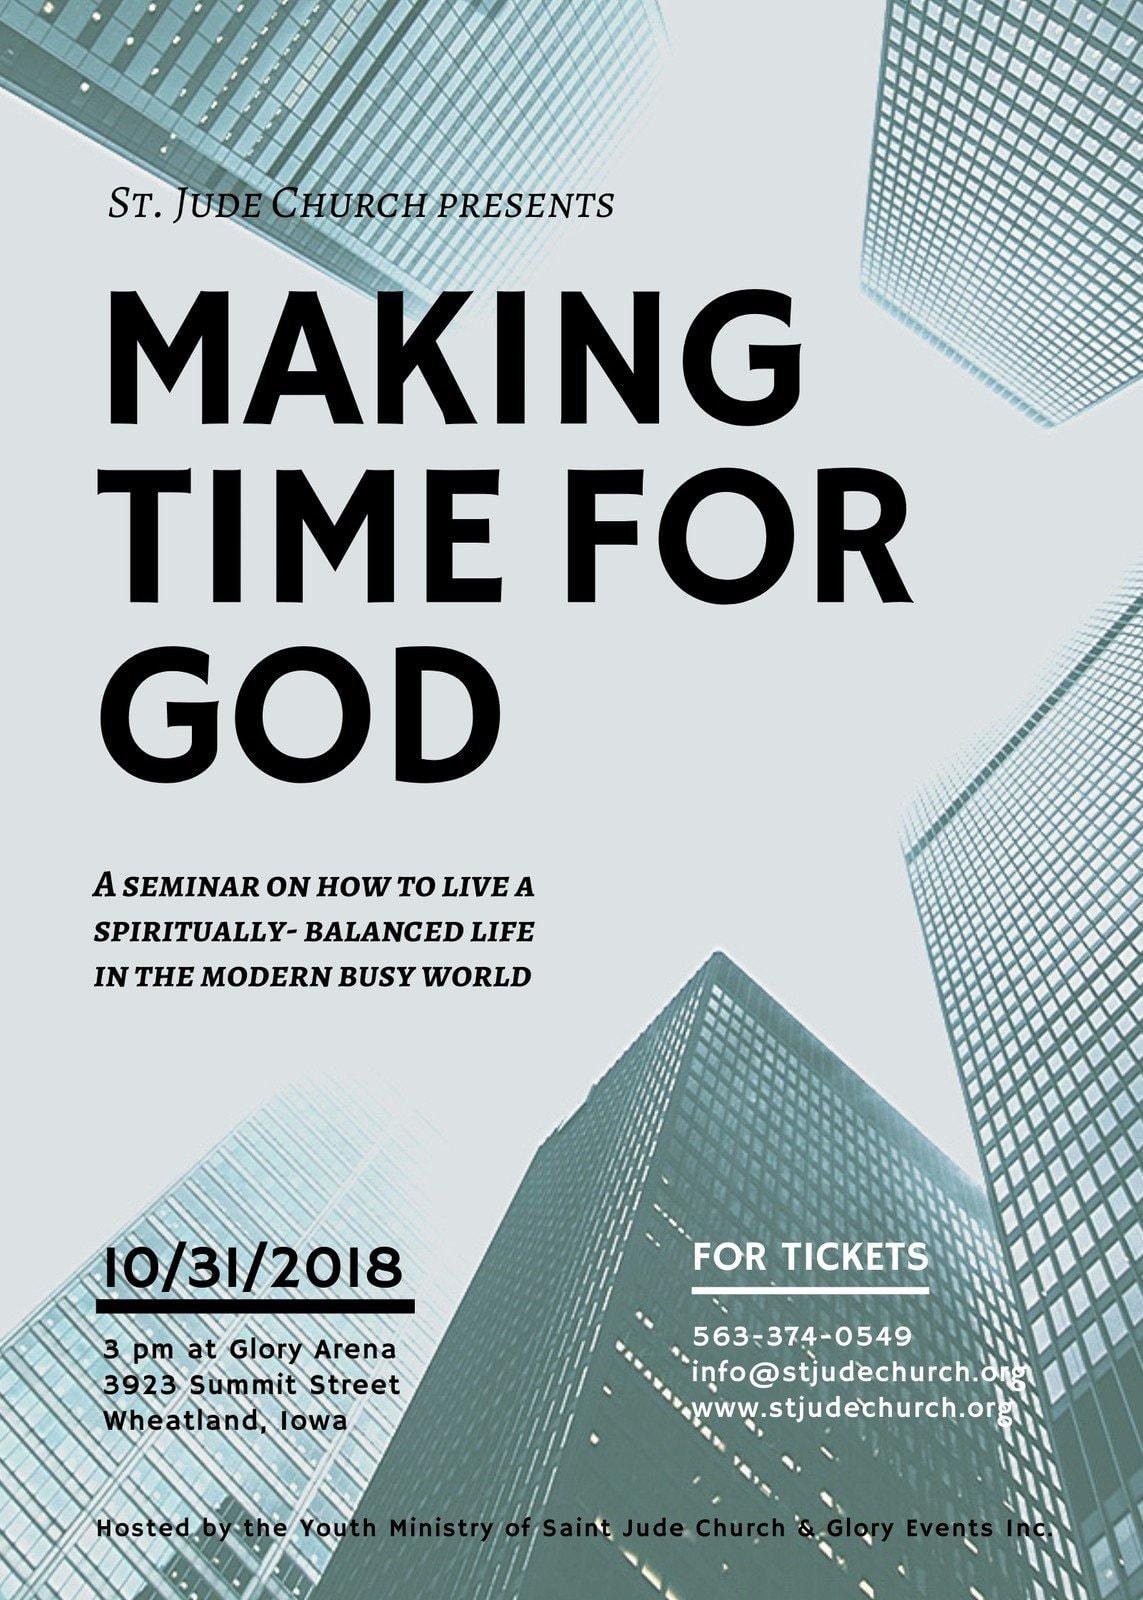 Photographic Church Seminar Flyer